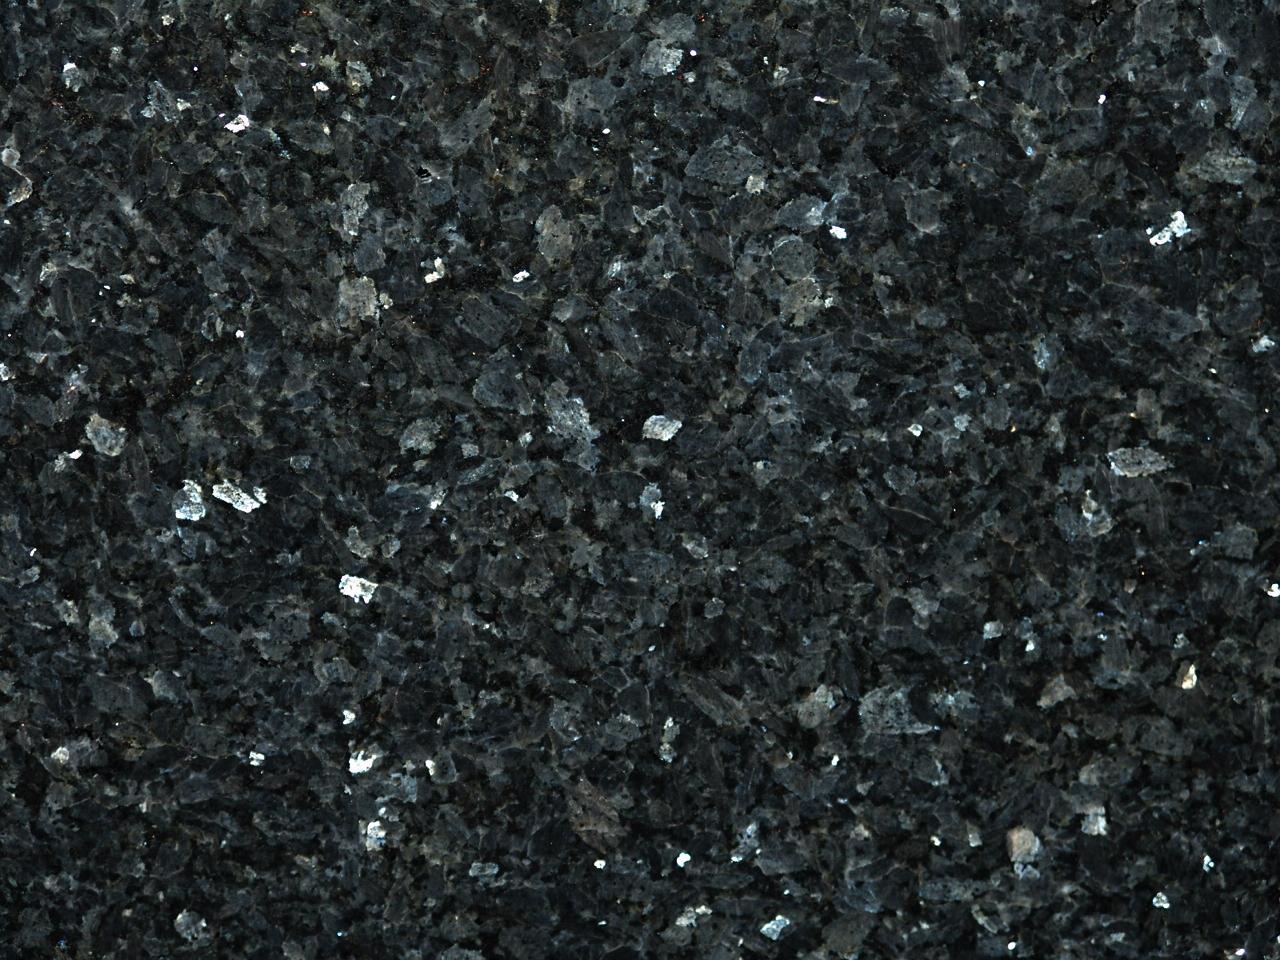 image picture photo of granites 9 new fantastico flash green golden crystal st louis. Black Bedroom Furniture Sets. Home Design Ideas